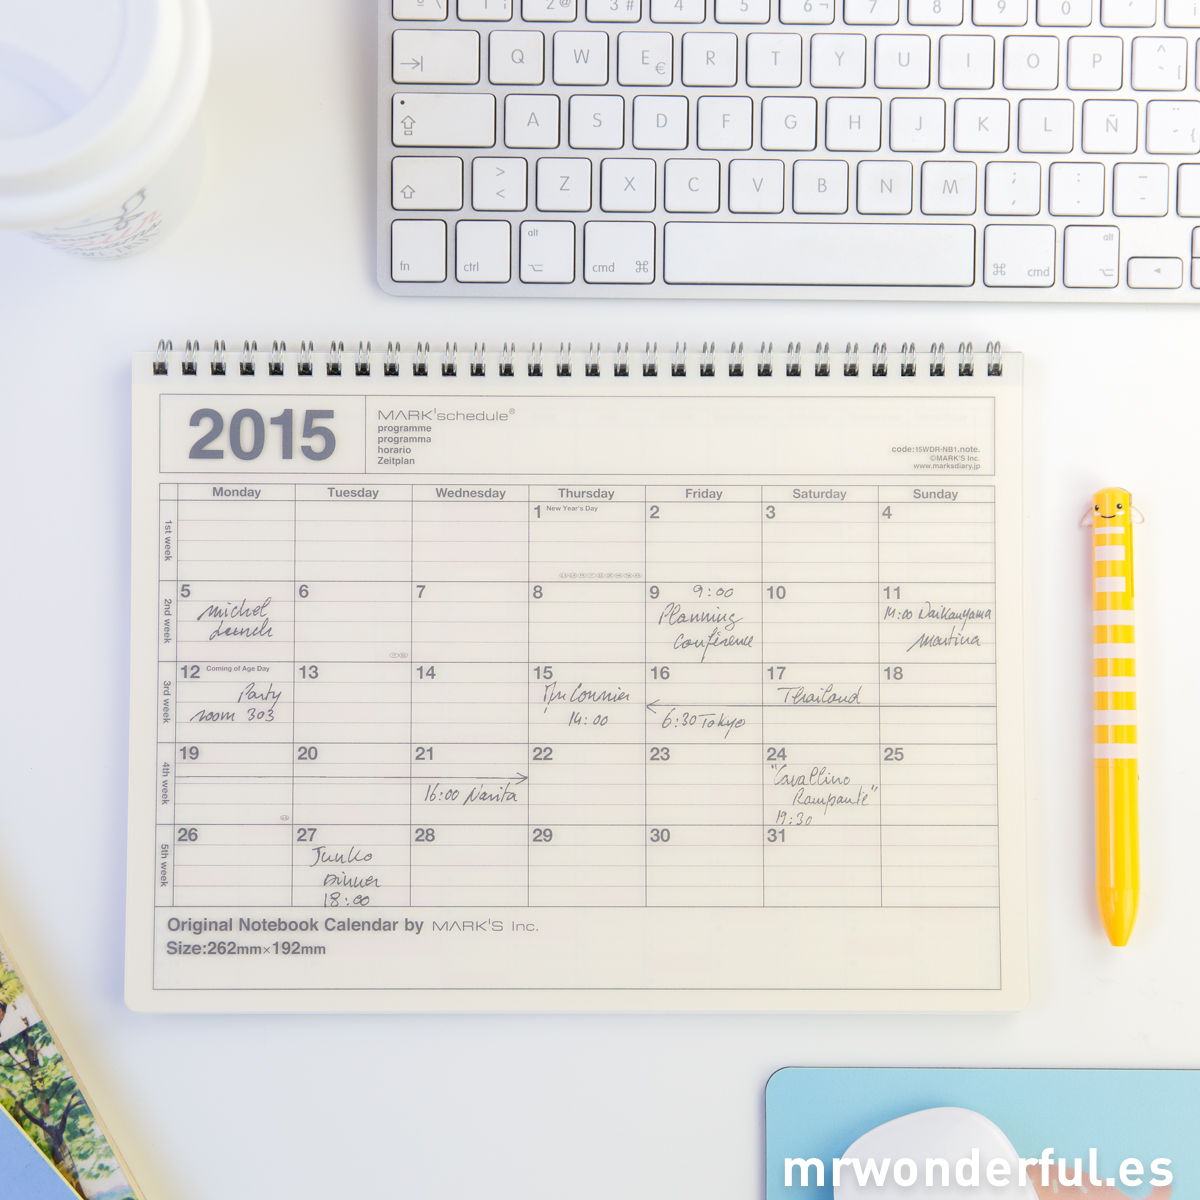 mrwonderful_15WDR-NB1-IV_calendario-planificador-mensual-2015-beige-3